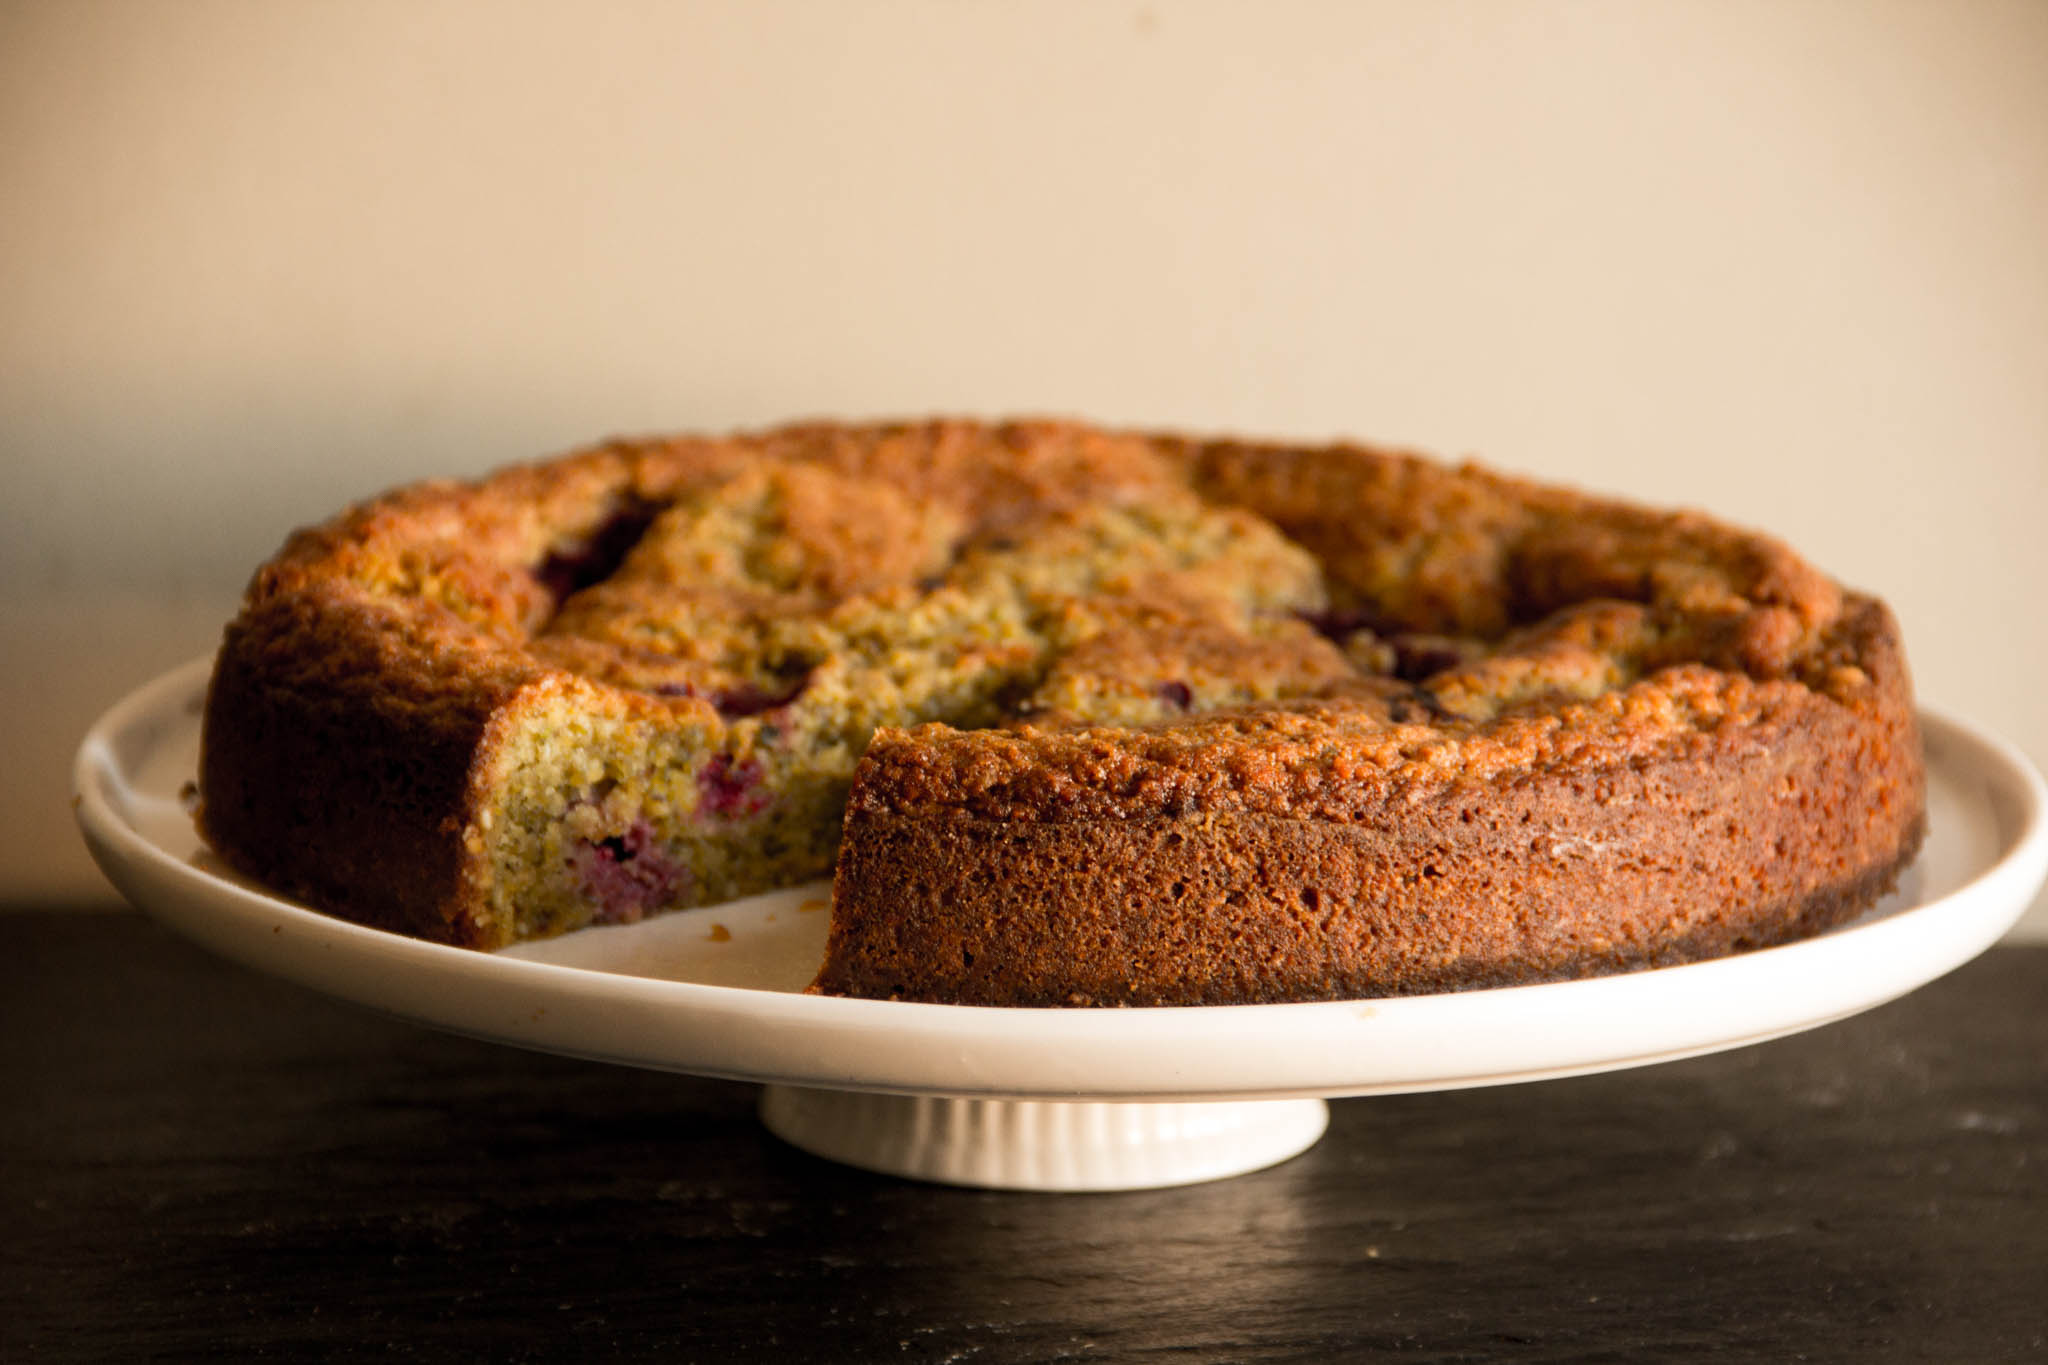 Substitute Cardamom In Cake Recipe